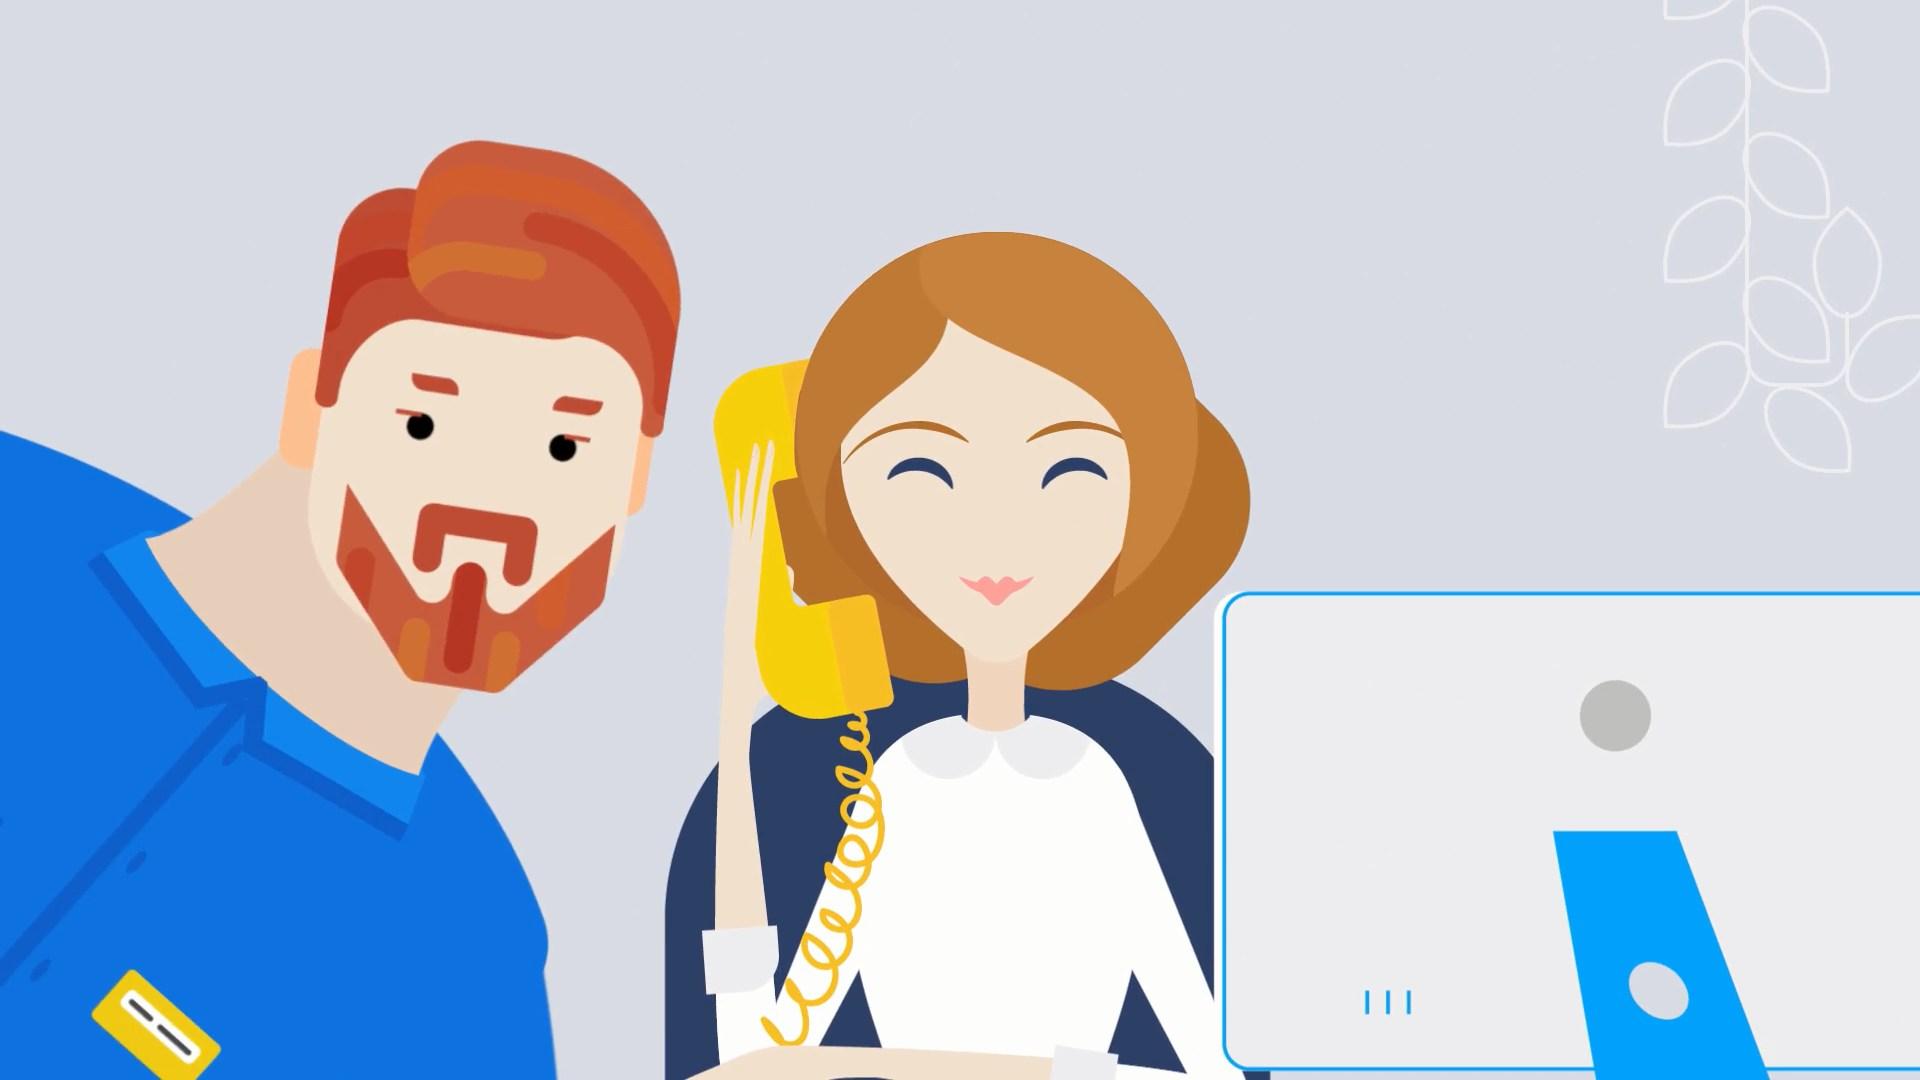 animation company communication